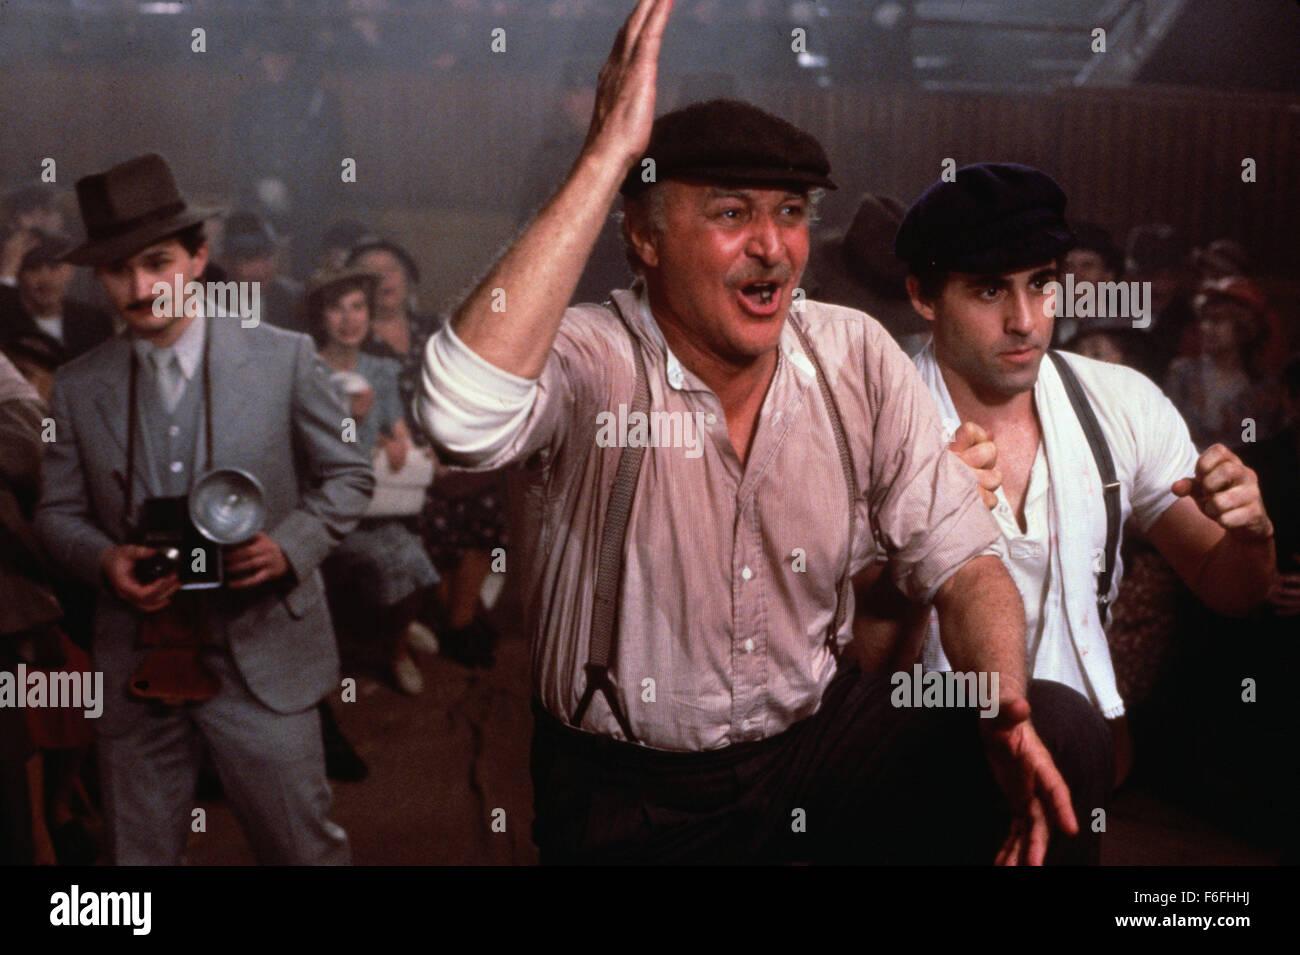 release date: 8 december 1989. movie title: triumph of the spirit